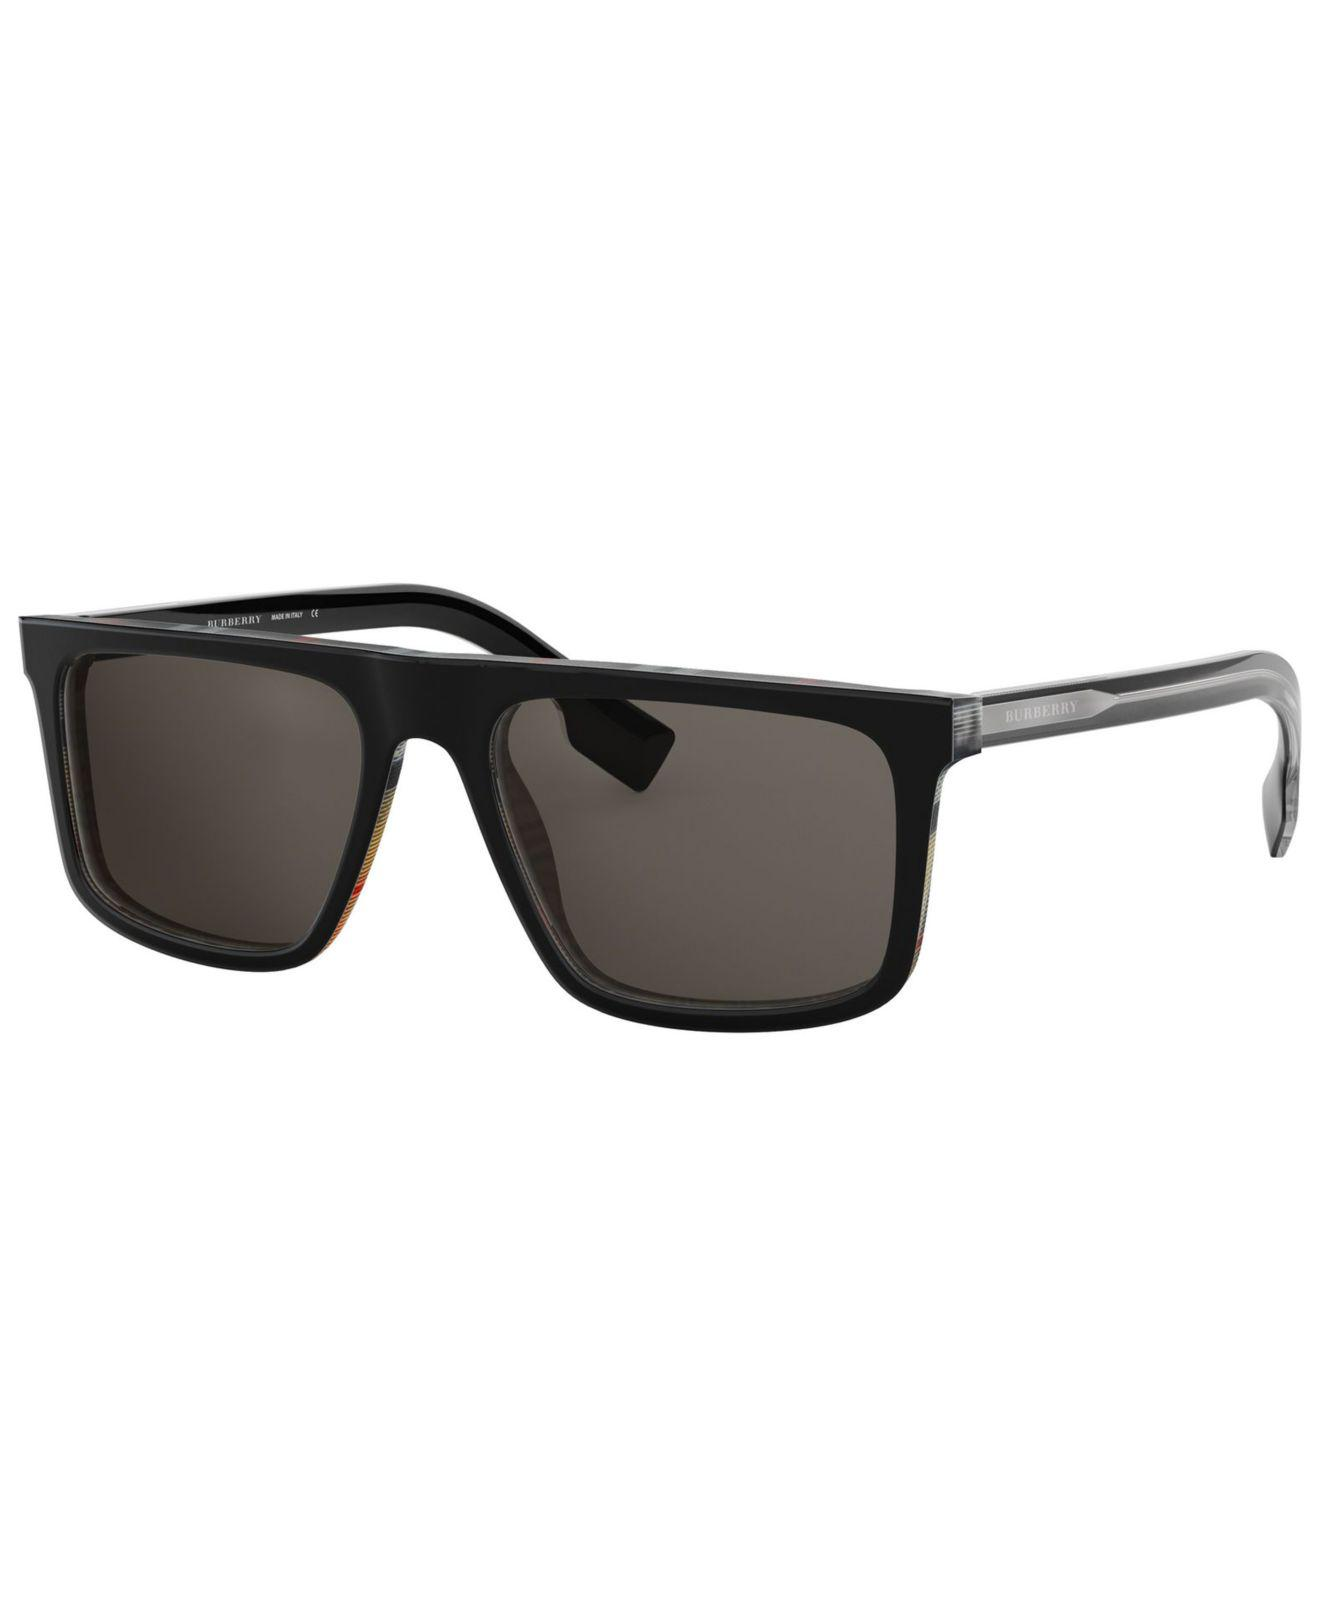 a0ed967aa7f Burberry - Black Sunglasses